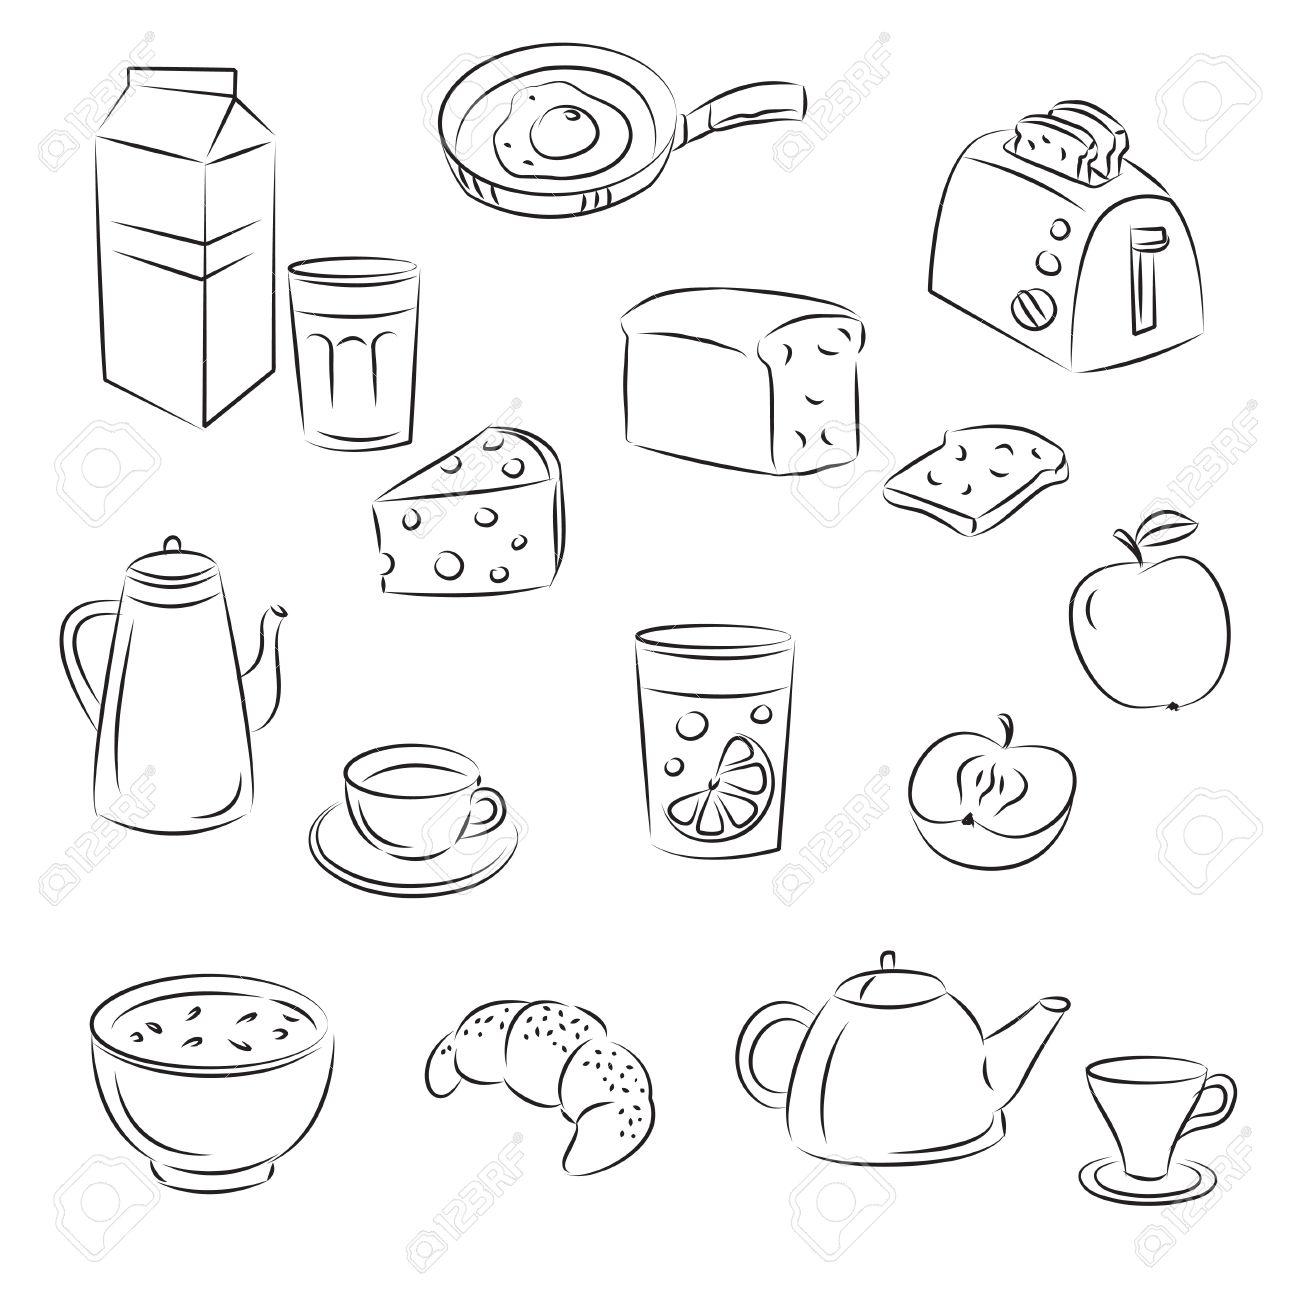 1300x1300 Sketch Clipart Set Breakfast Food Royalty Free Cliparts, Vectors